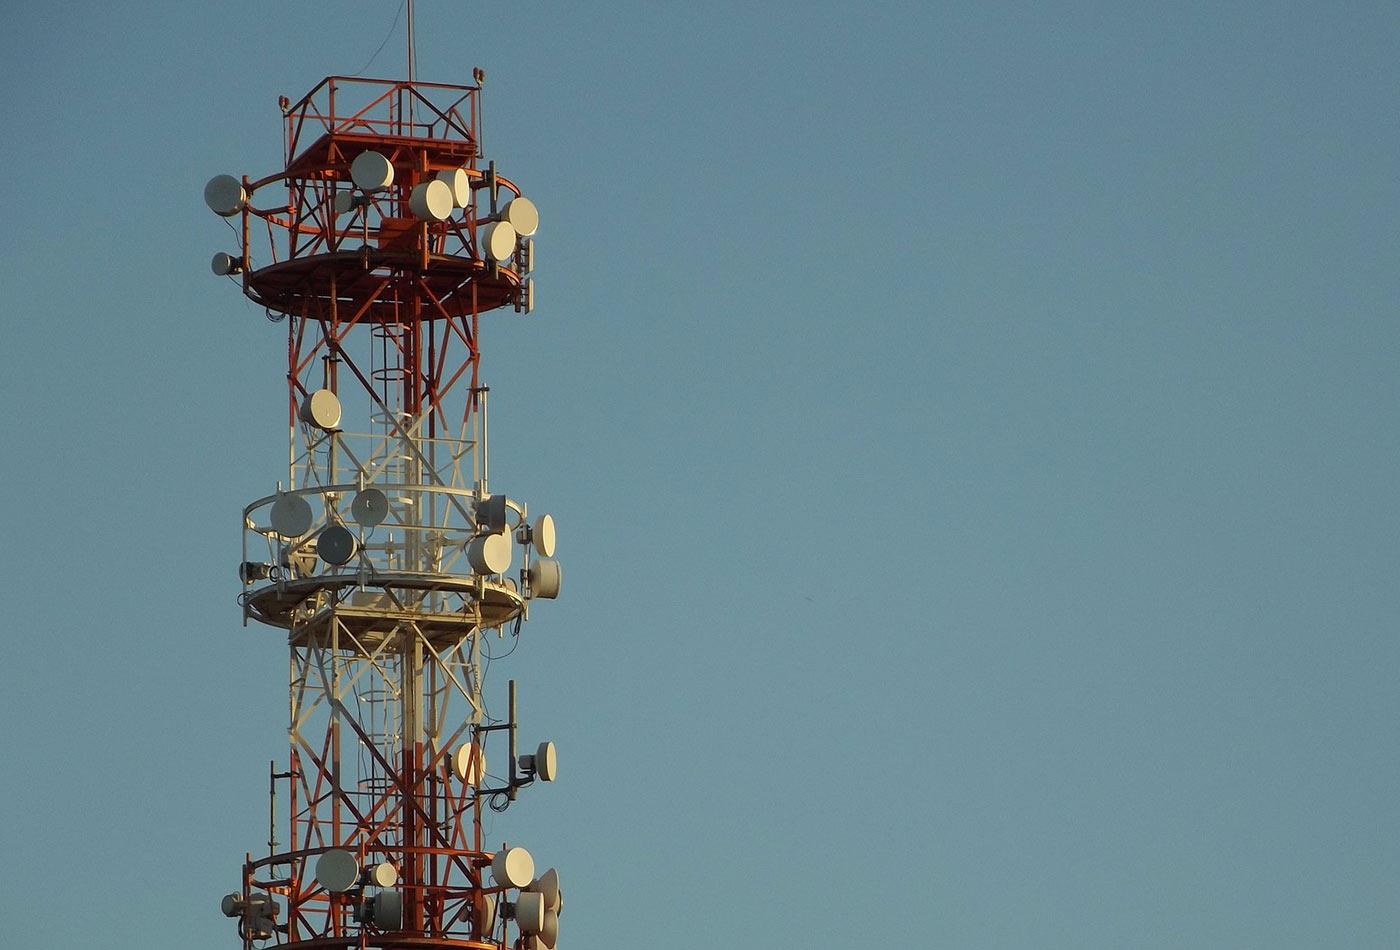 Cellular network.